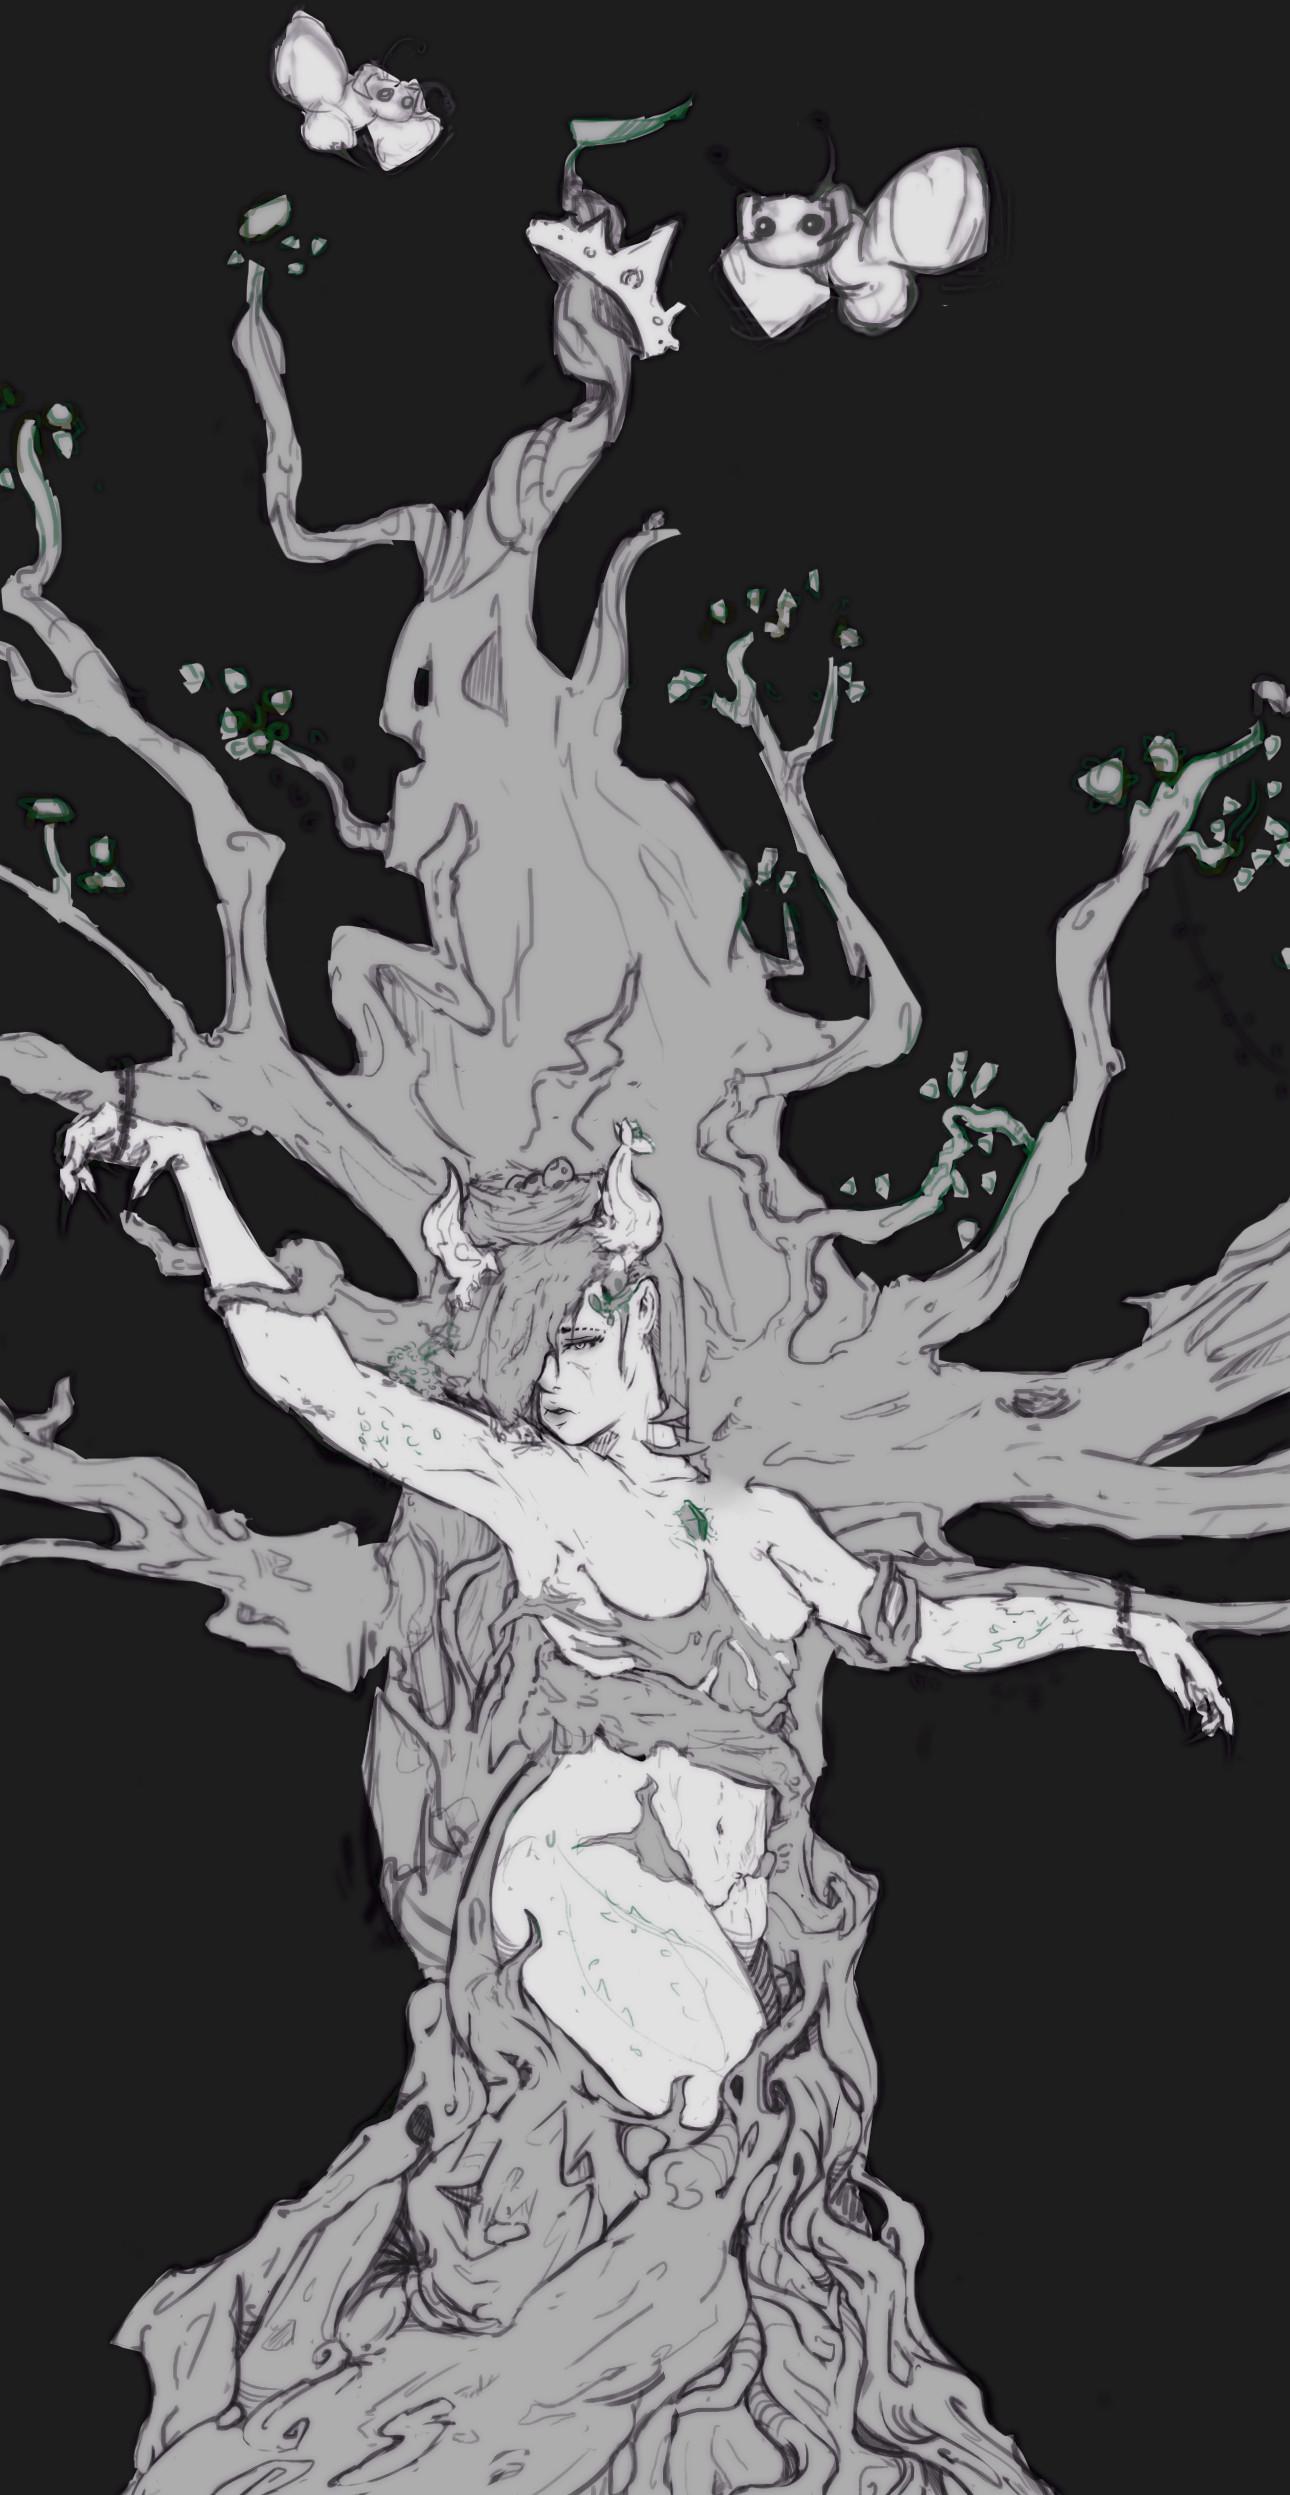 Boyan kazalov treegirlsketch2